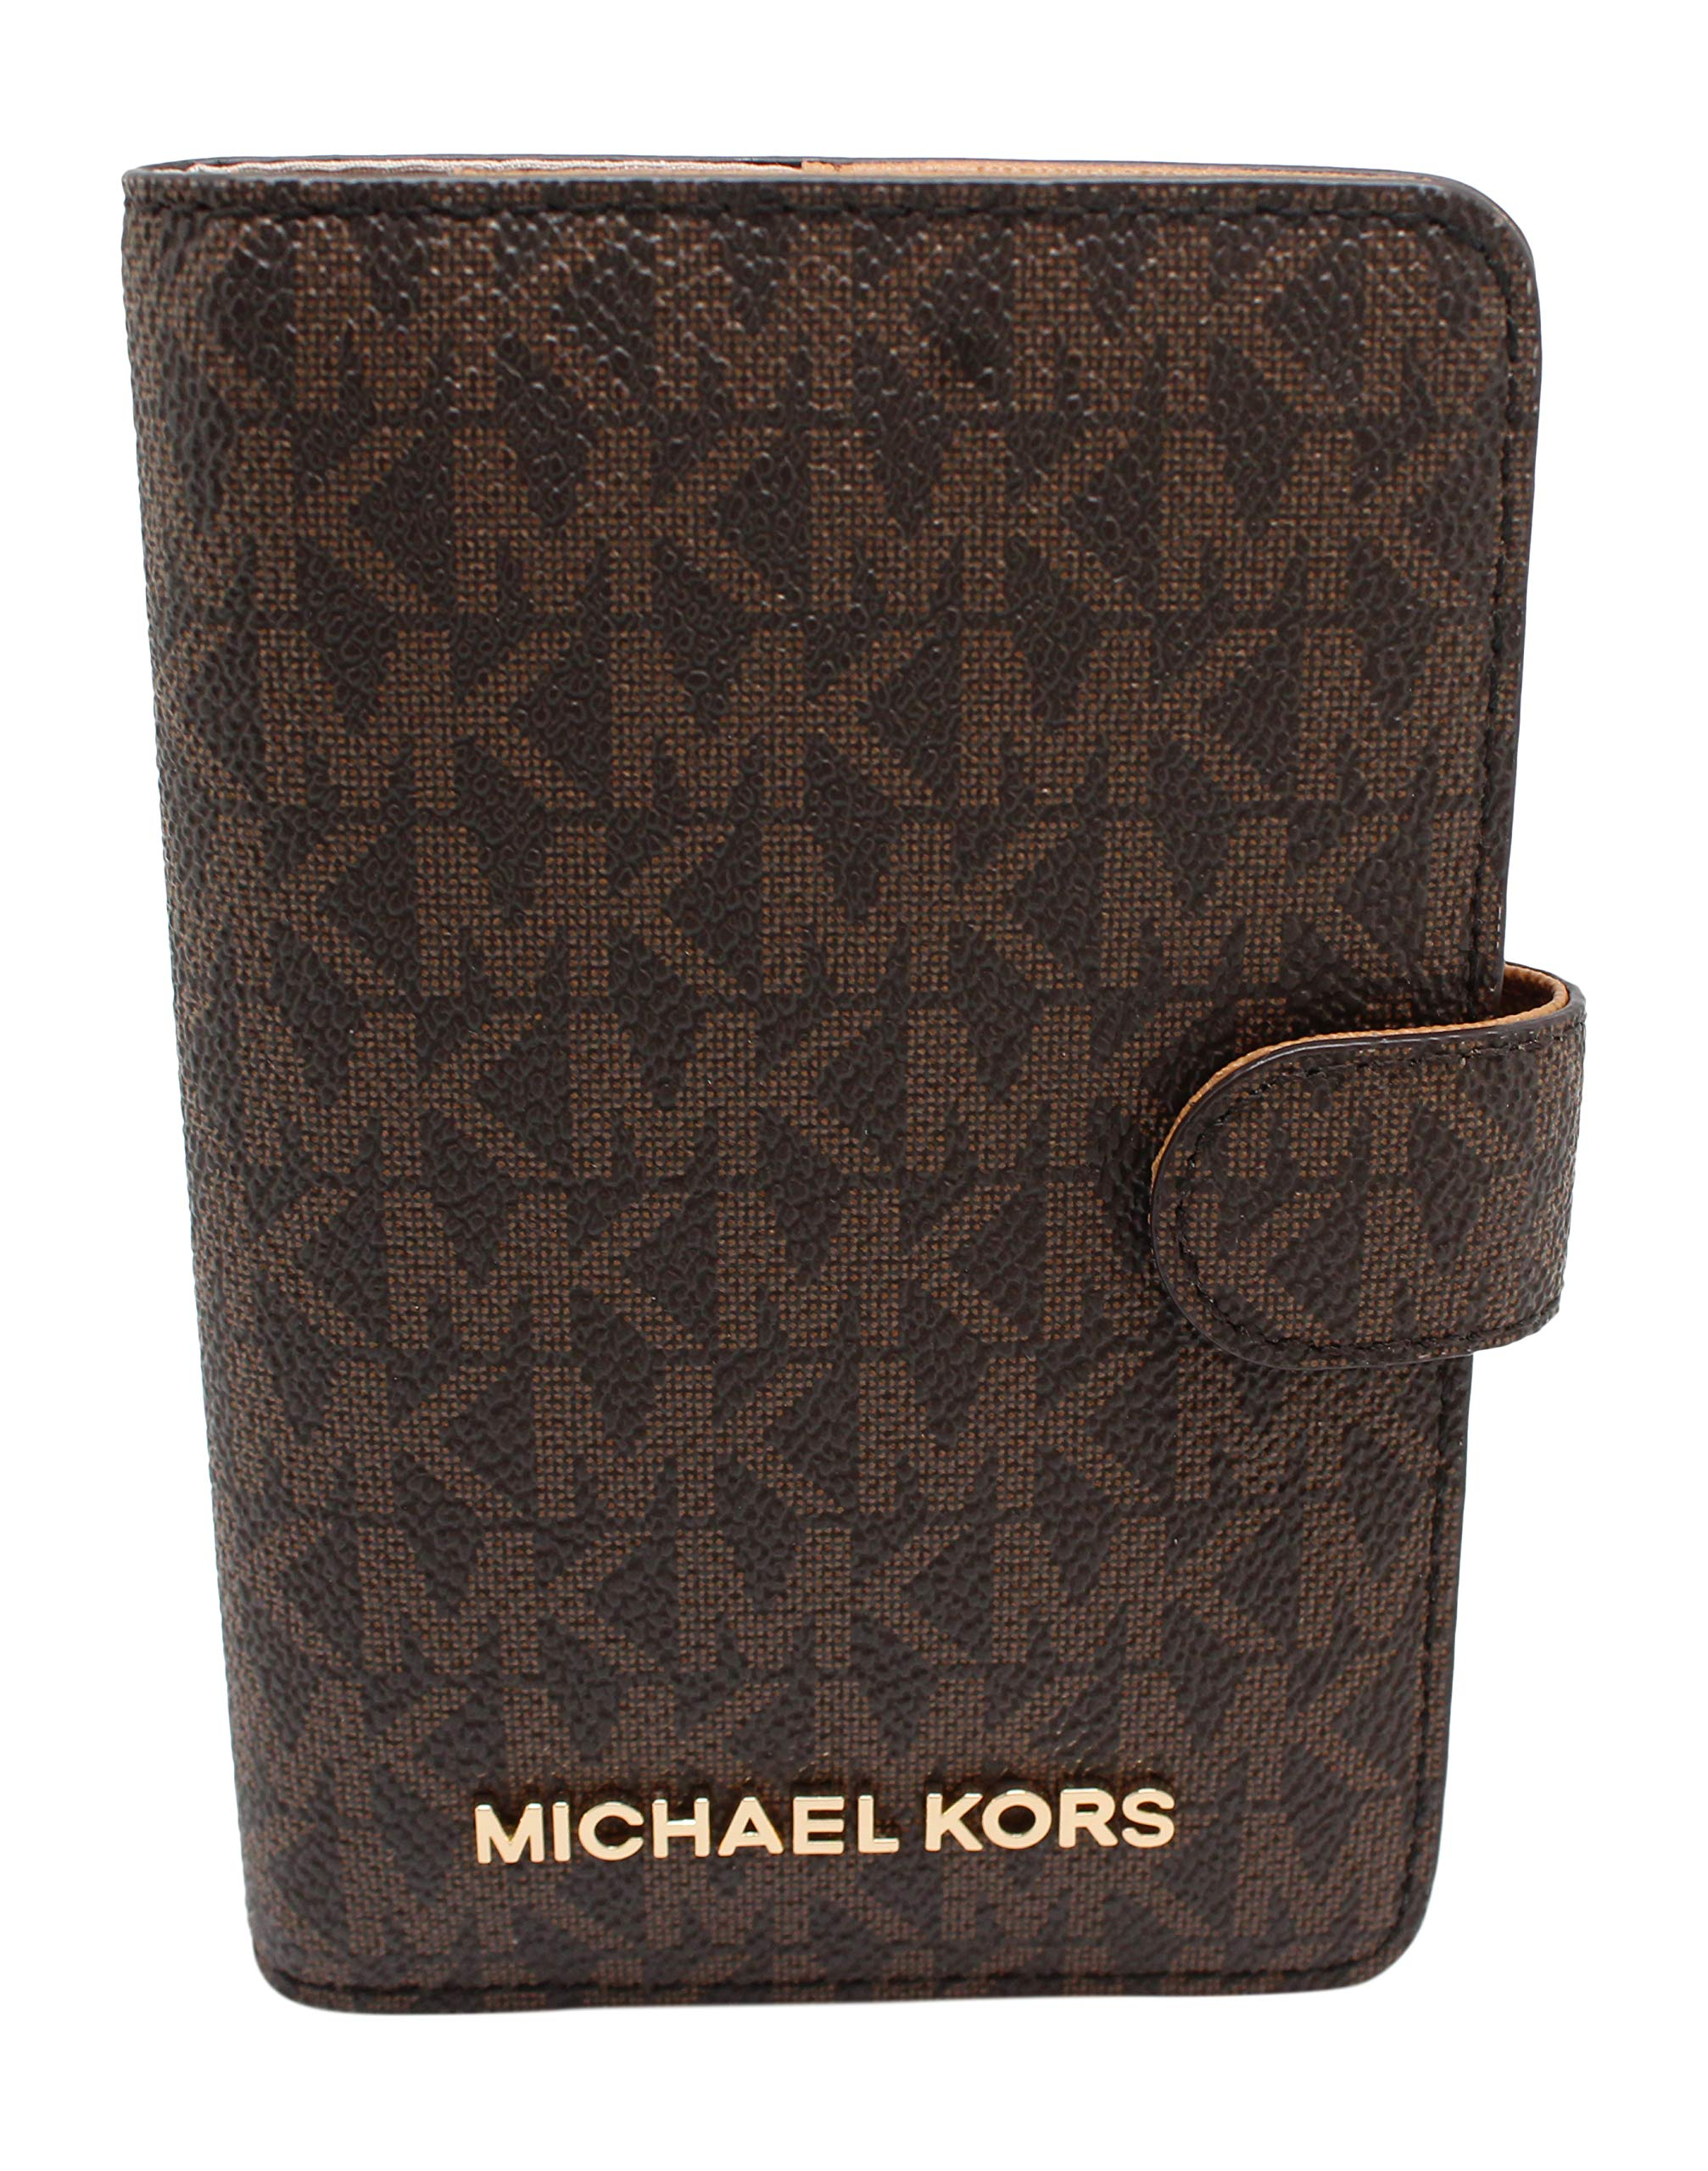 Michael Kors Jet Set Travel Passport Case Wallet (Brown PVC 2018) by Michael Kors